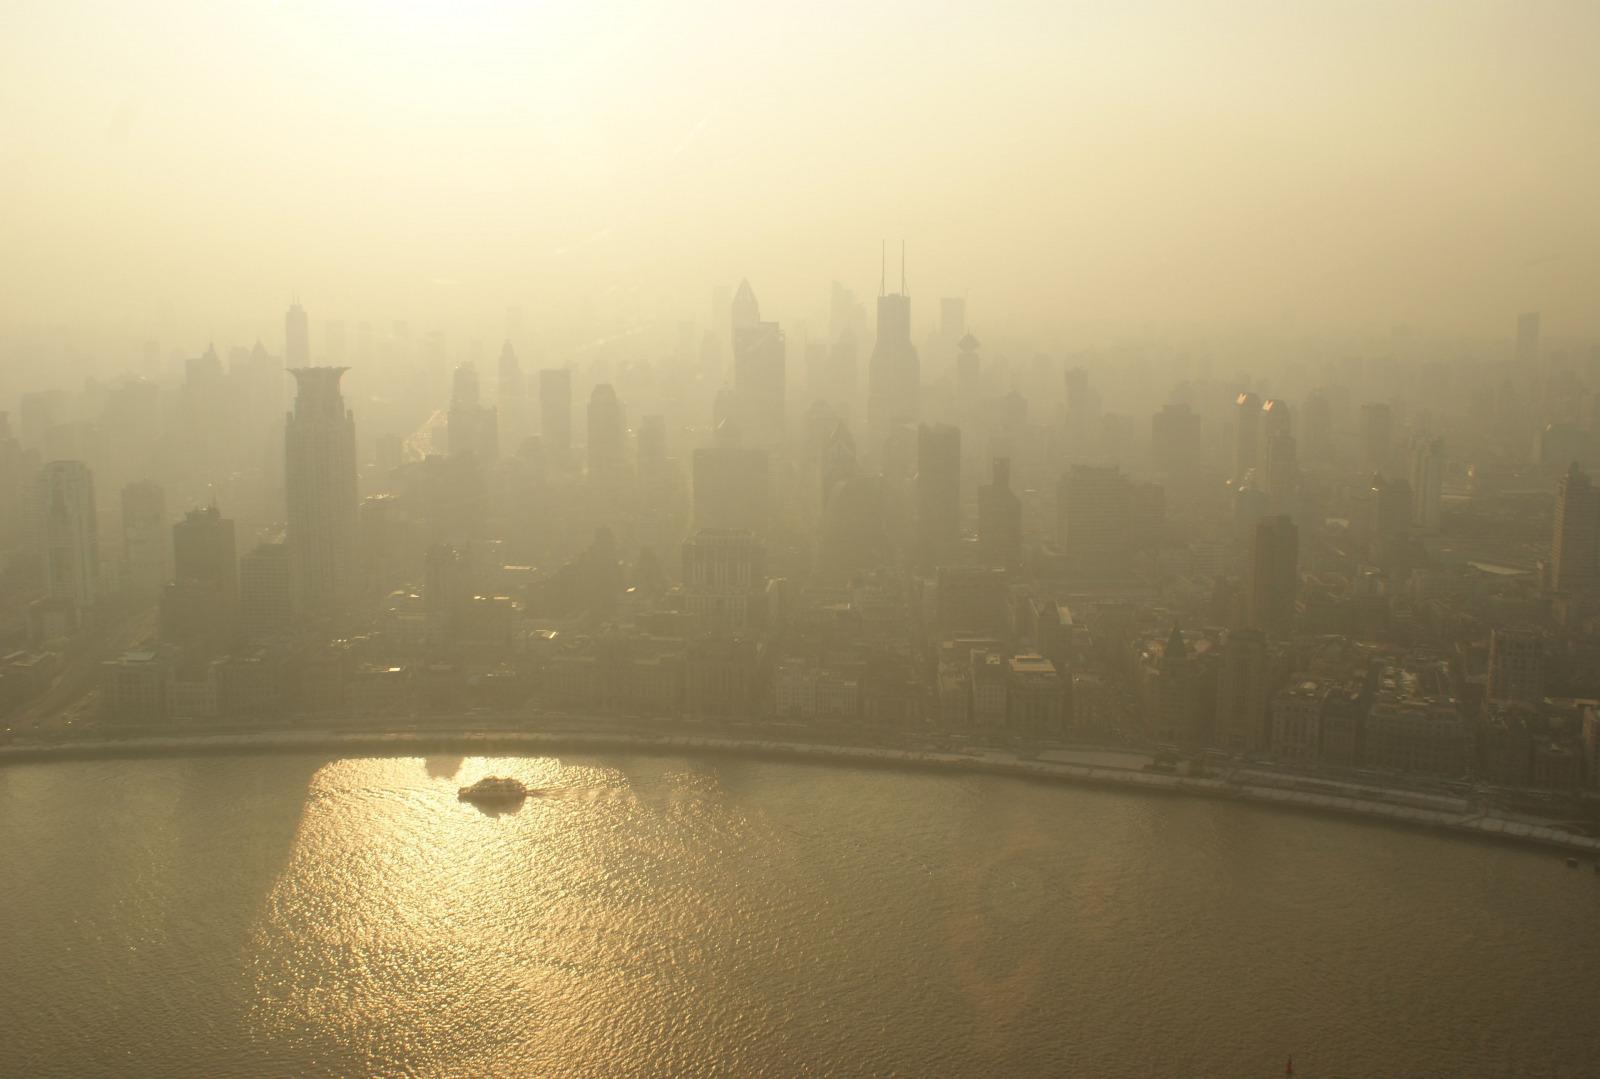 smog city alex gindin ifpBOcQlhoY unsplash